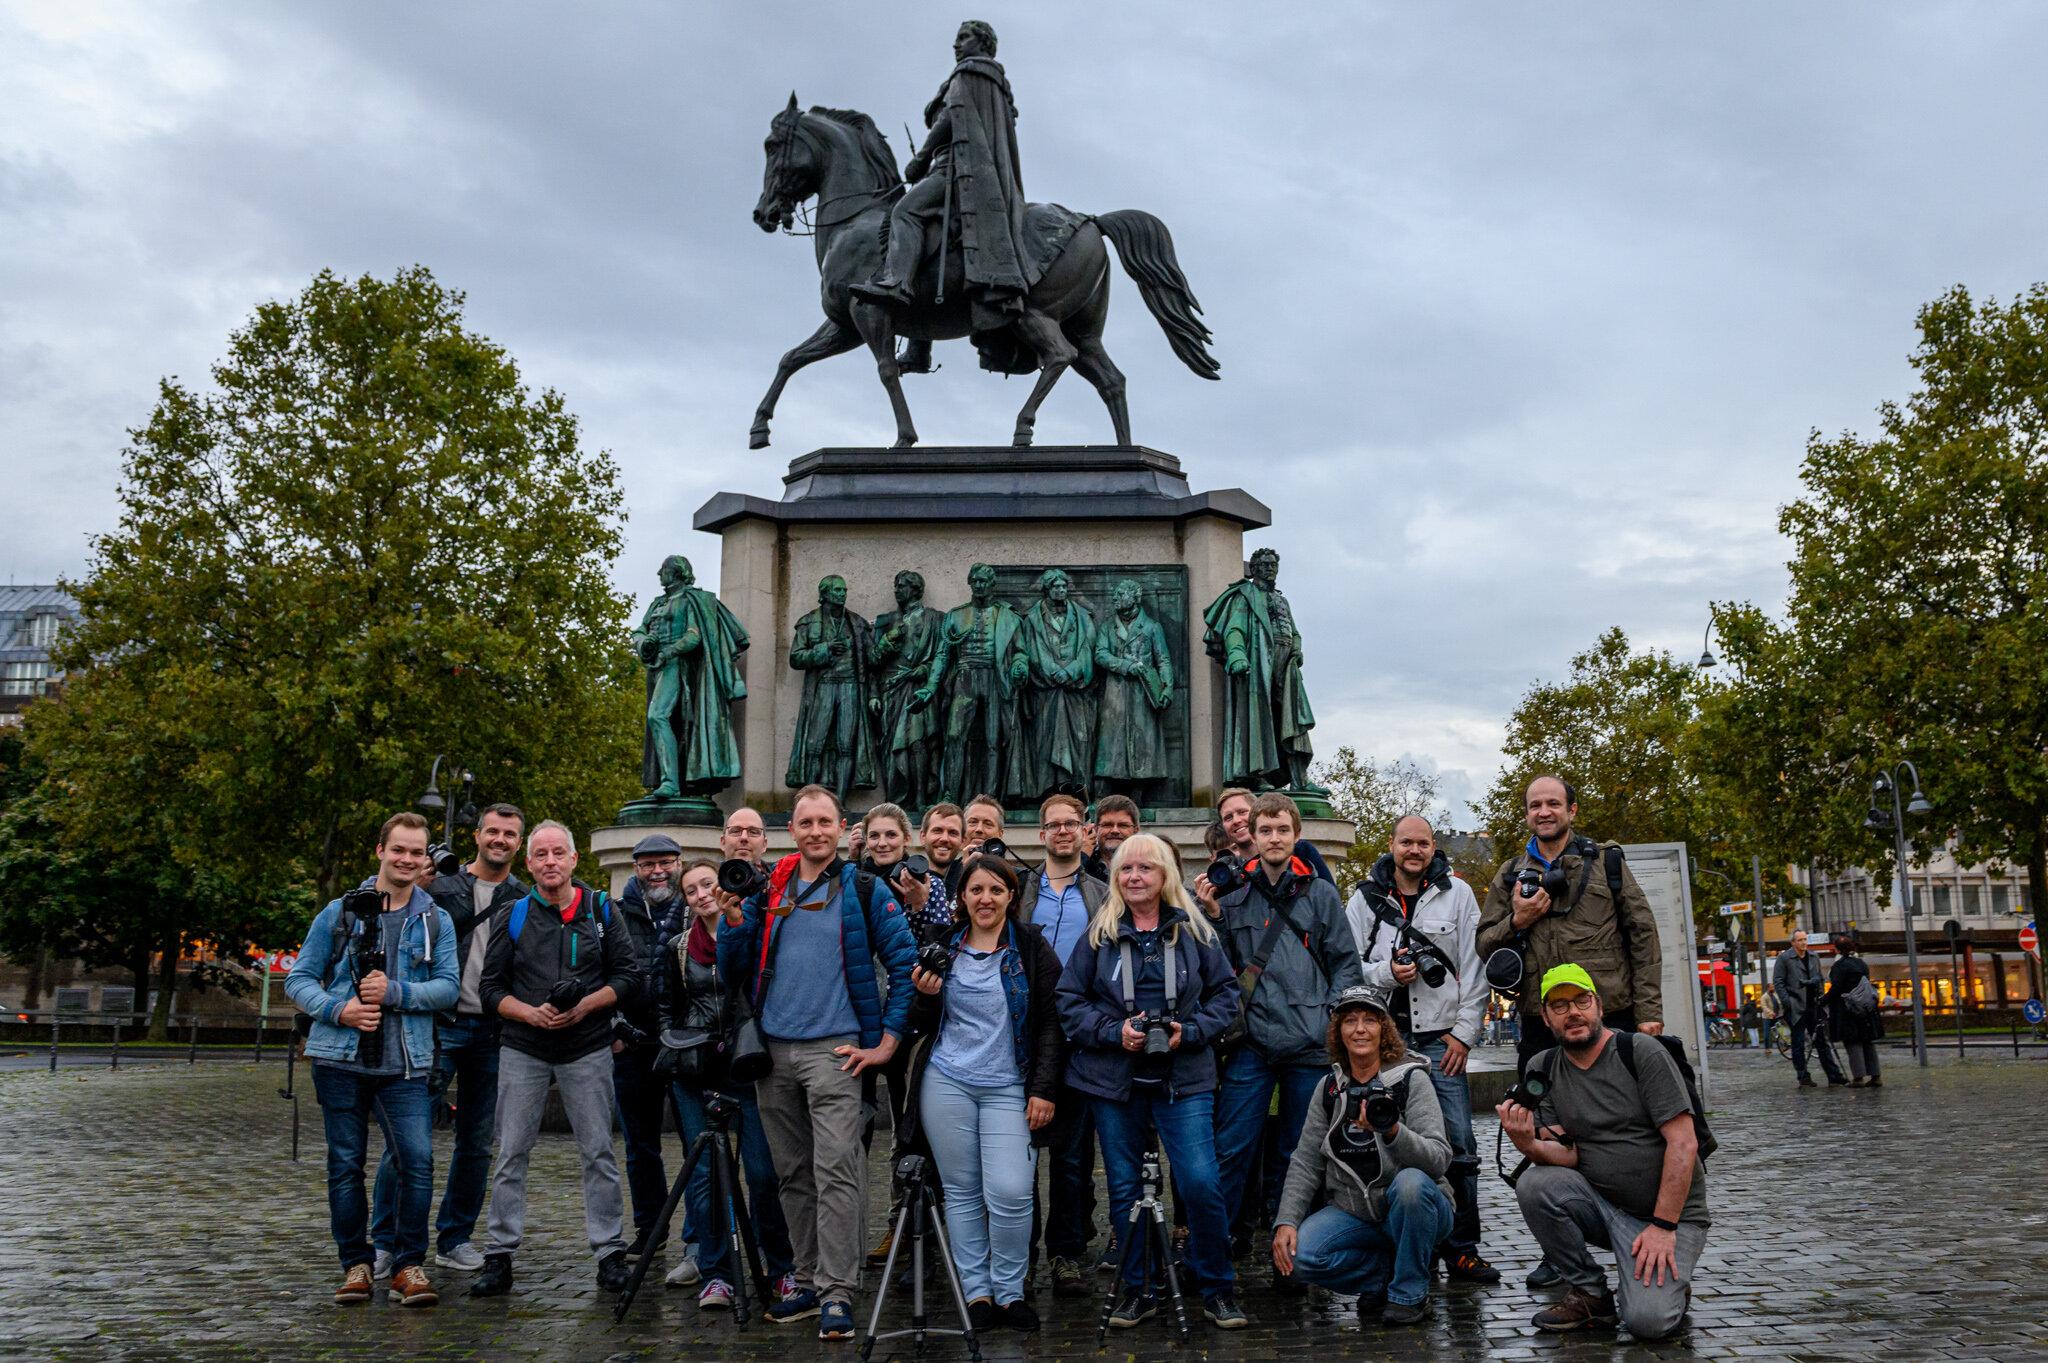 28. Photowalk - Altstadt - Regen in Köln - Gruppenbild